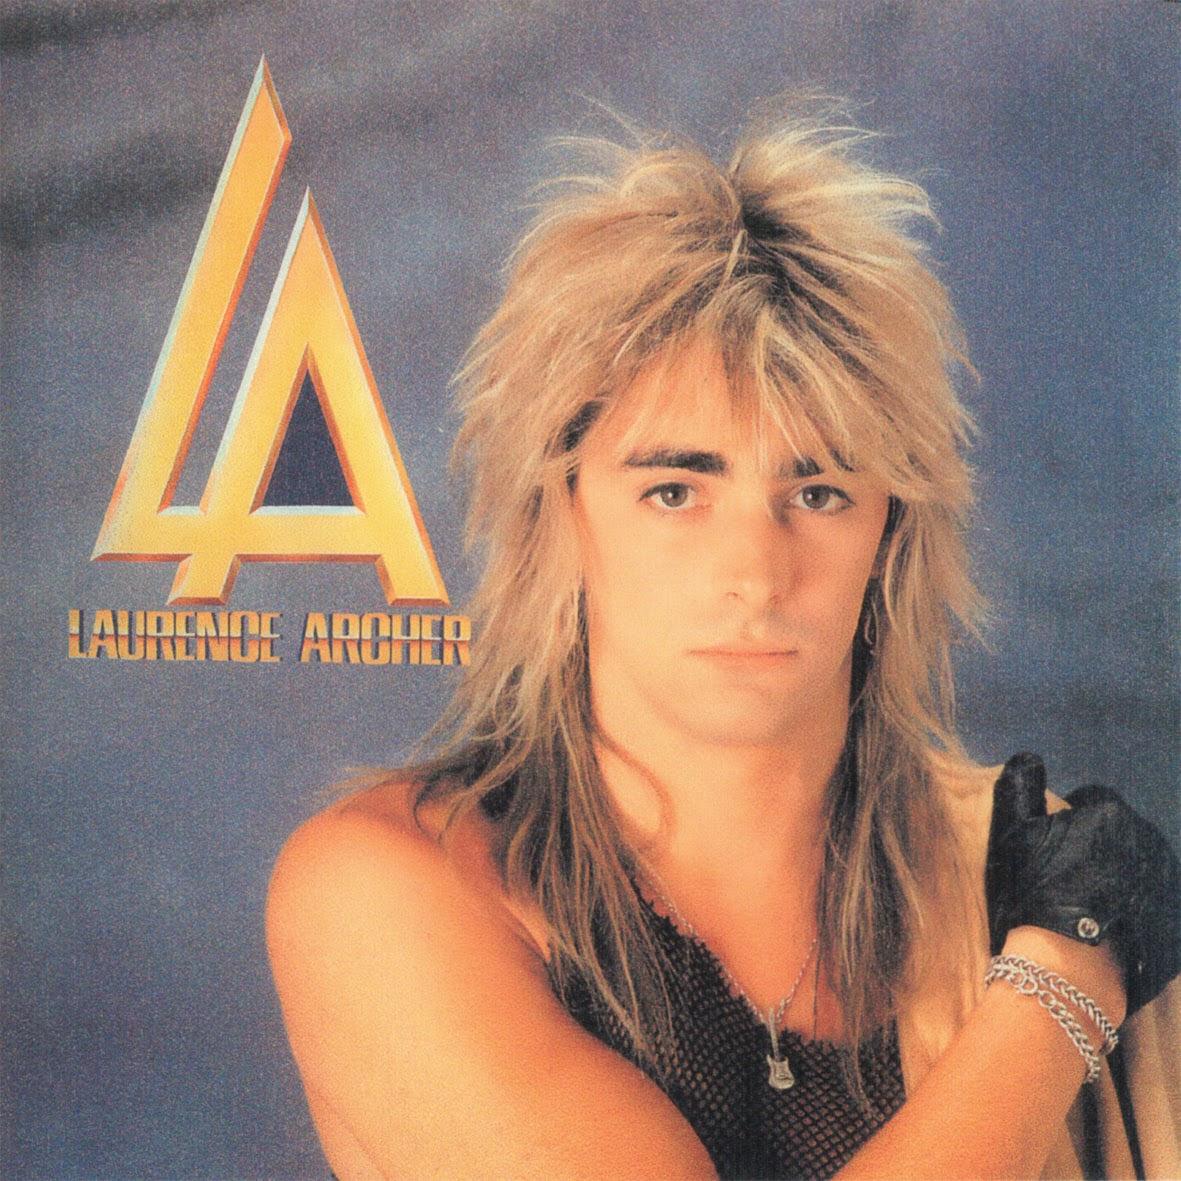 Laurence Archer st LA 1986 aor melodic rock